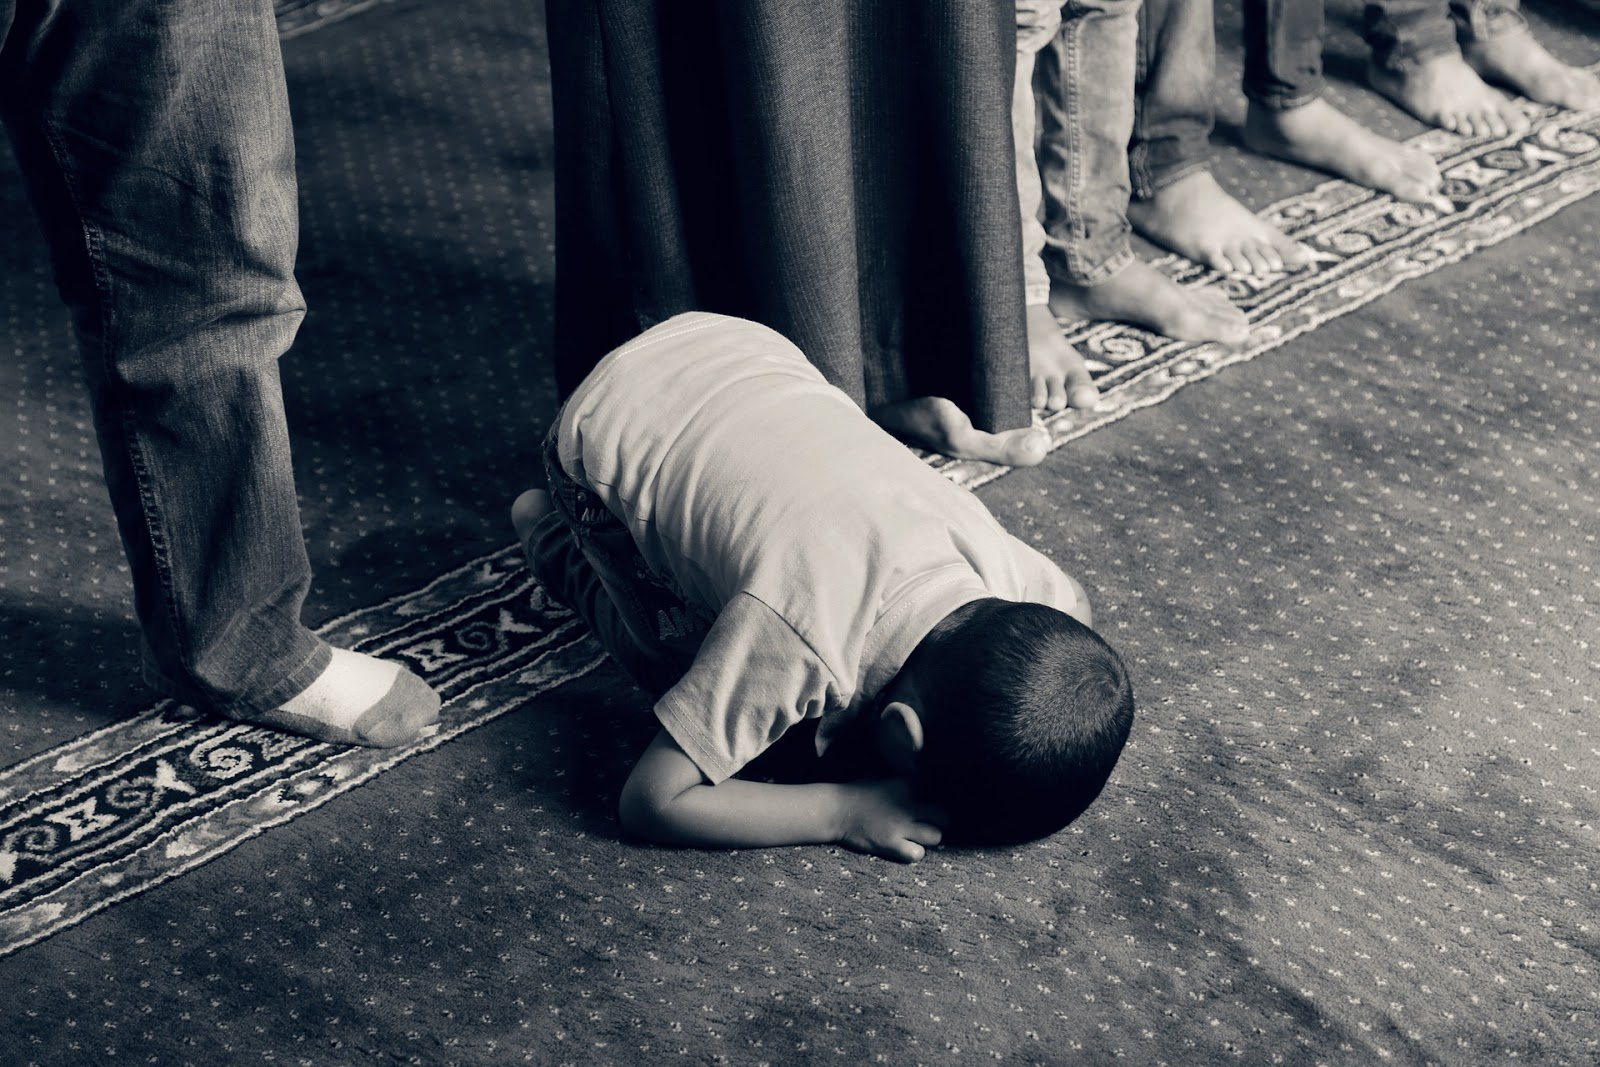 prayer_muslim